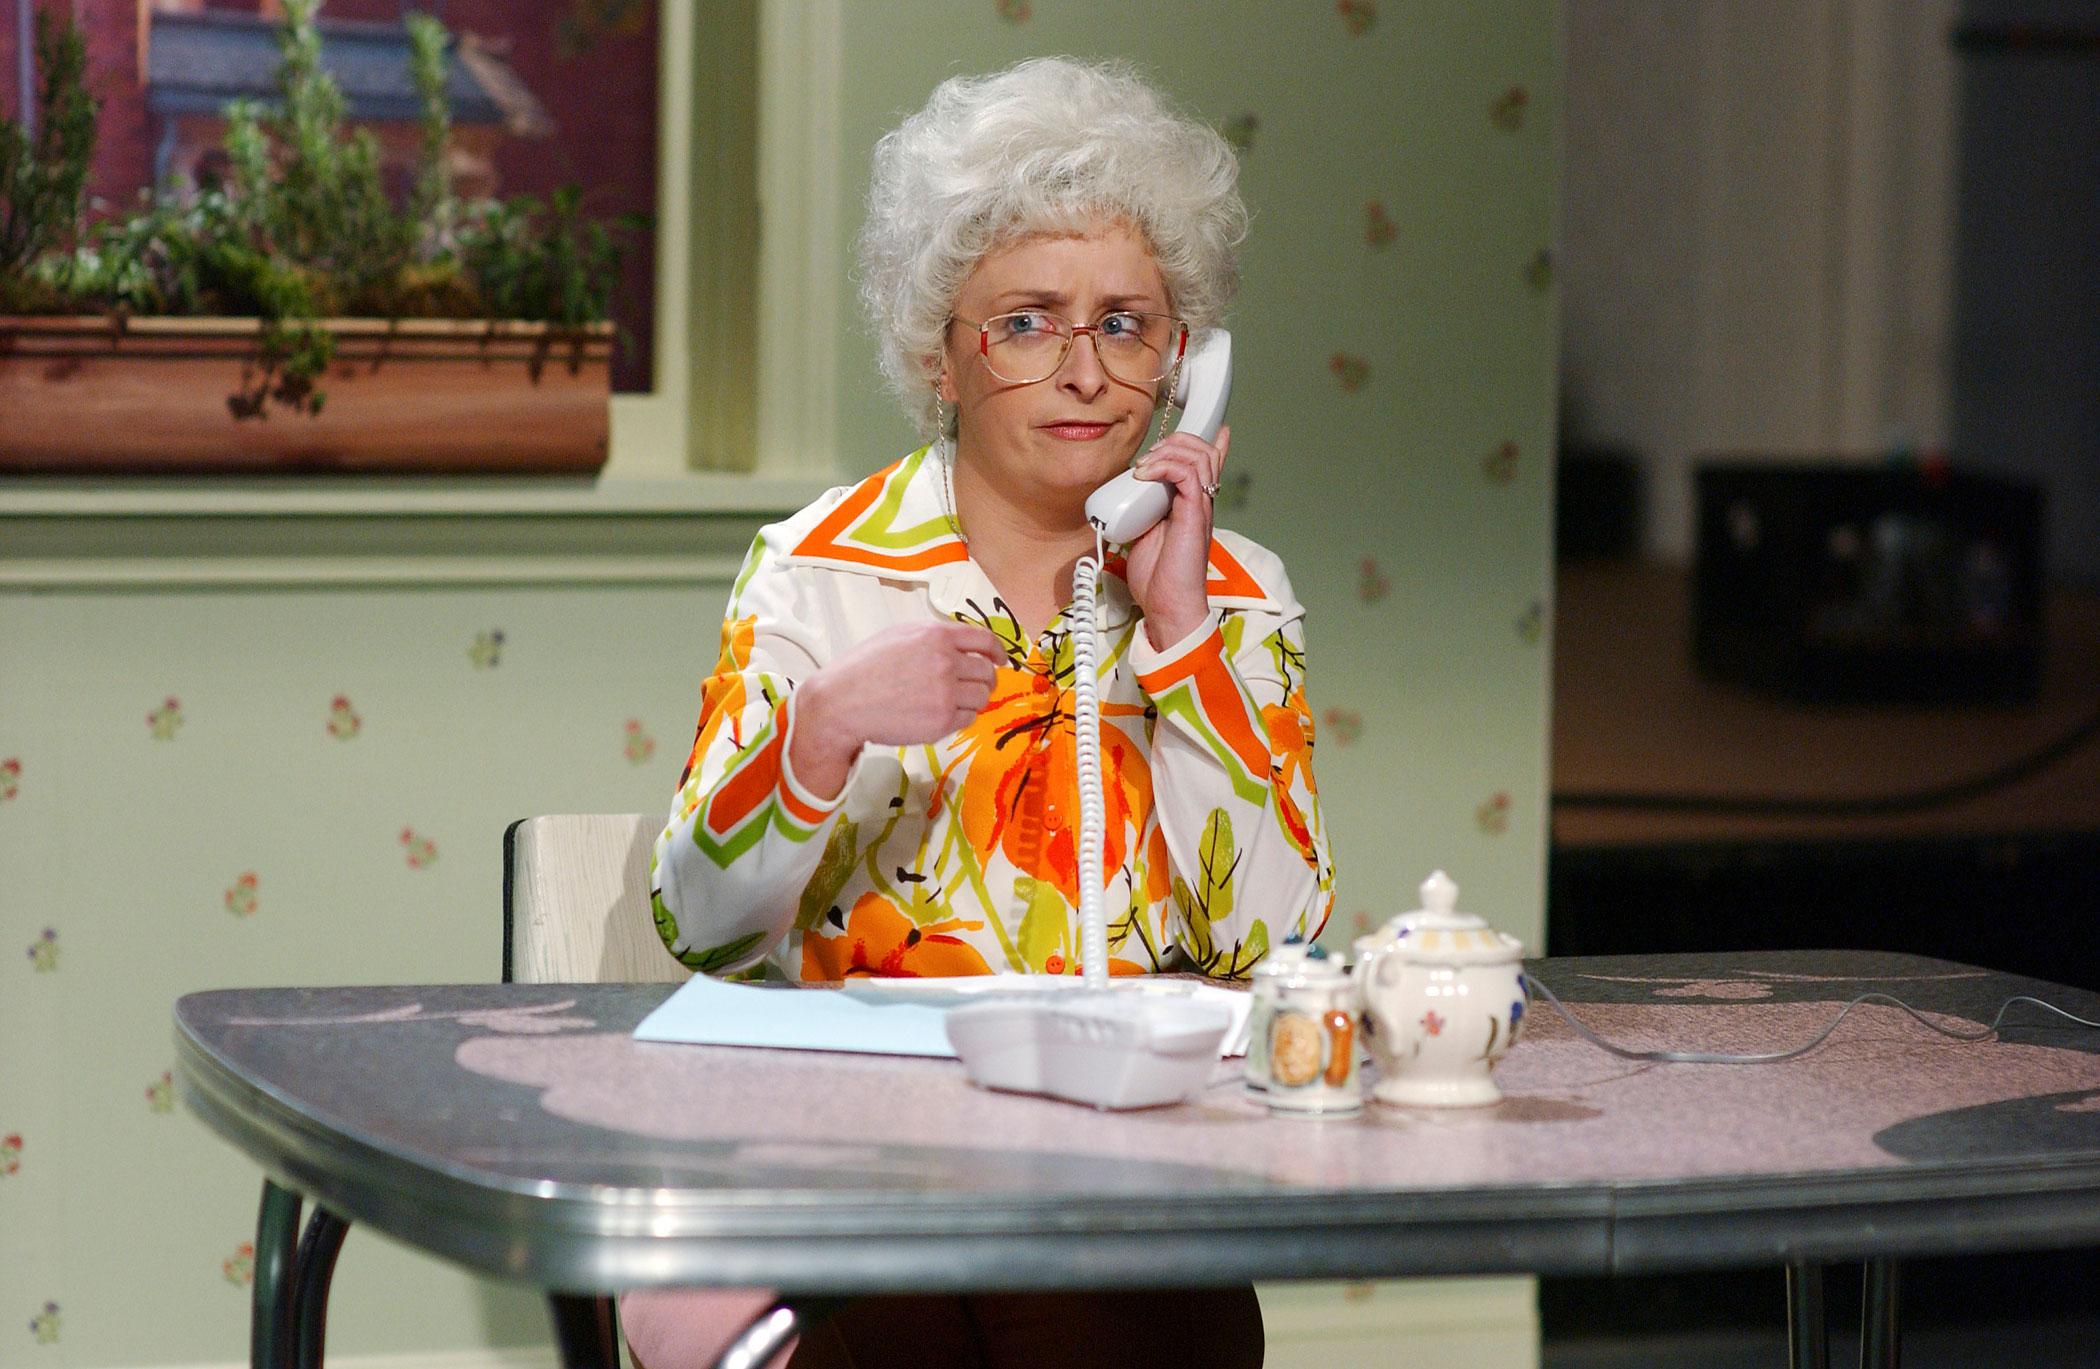 Rachel Dratch as Peg during the Elderly Wiretap skit on Jan. 21, 2006.